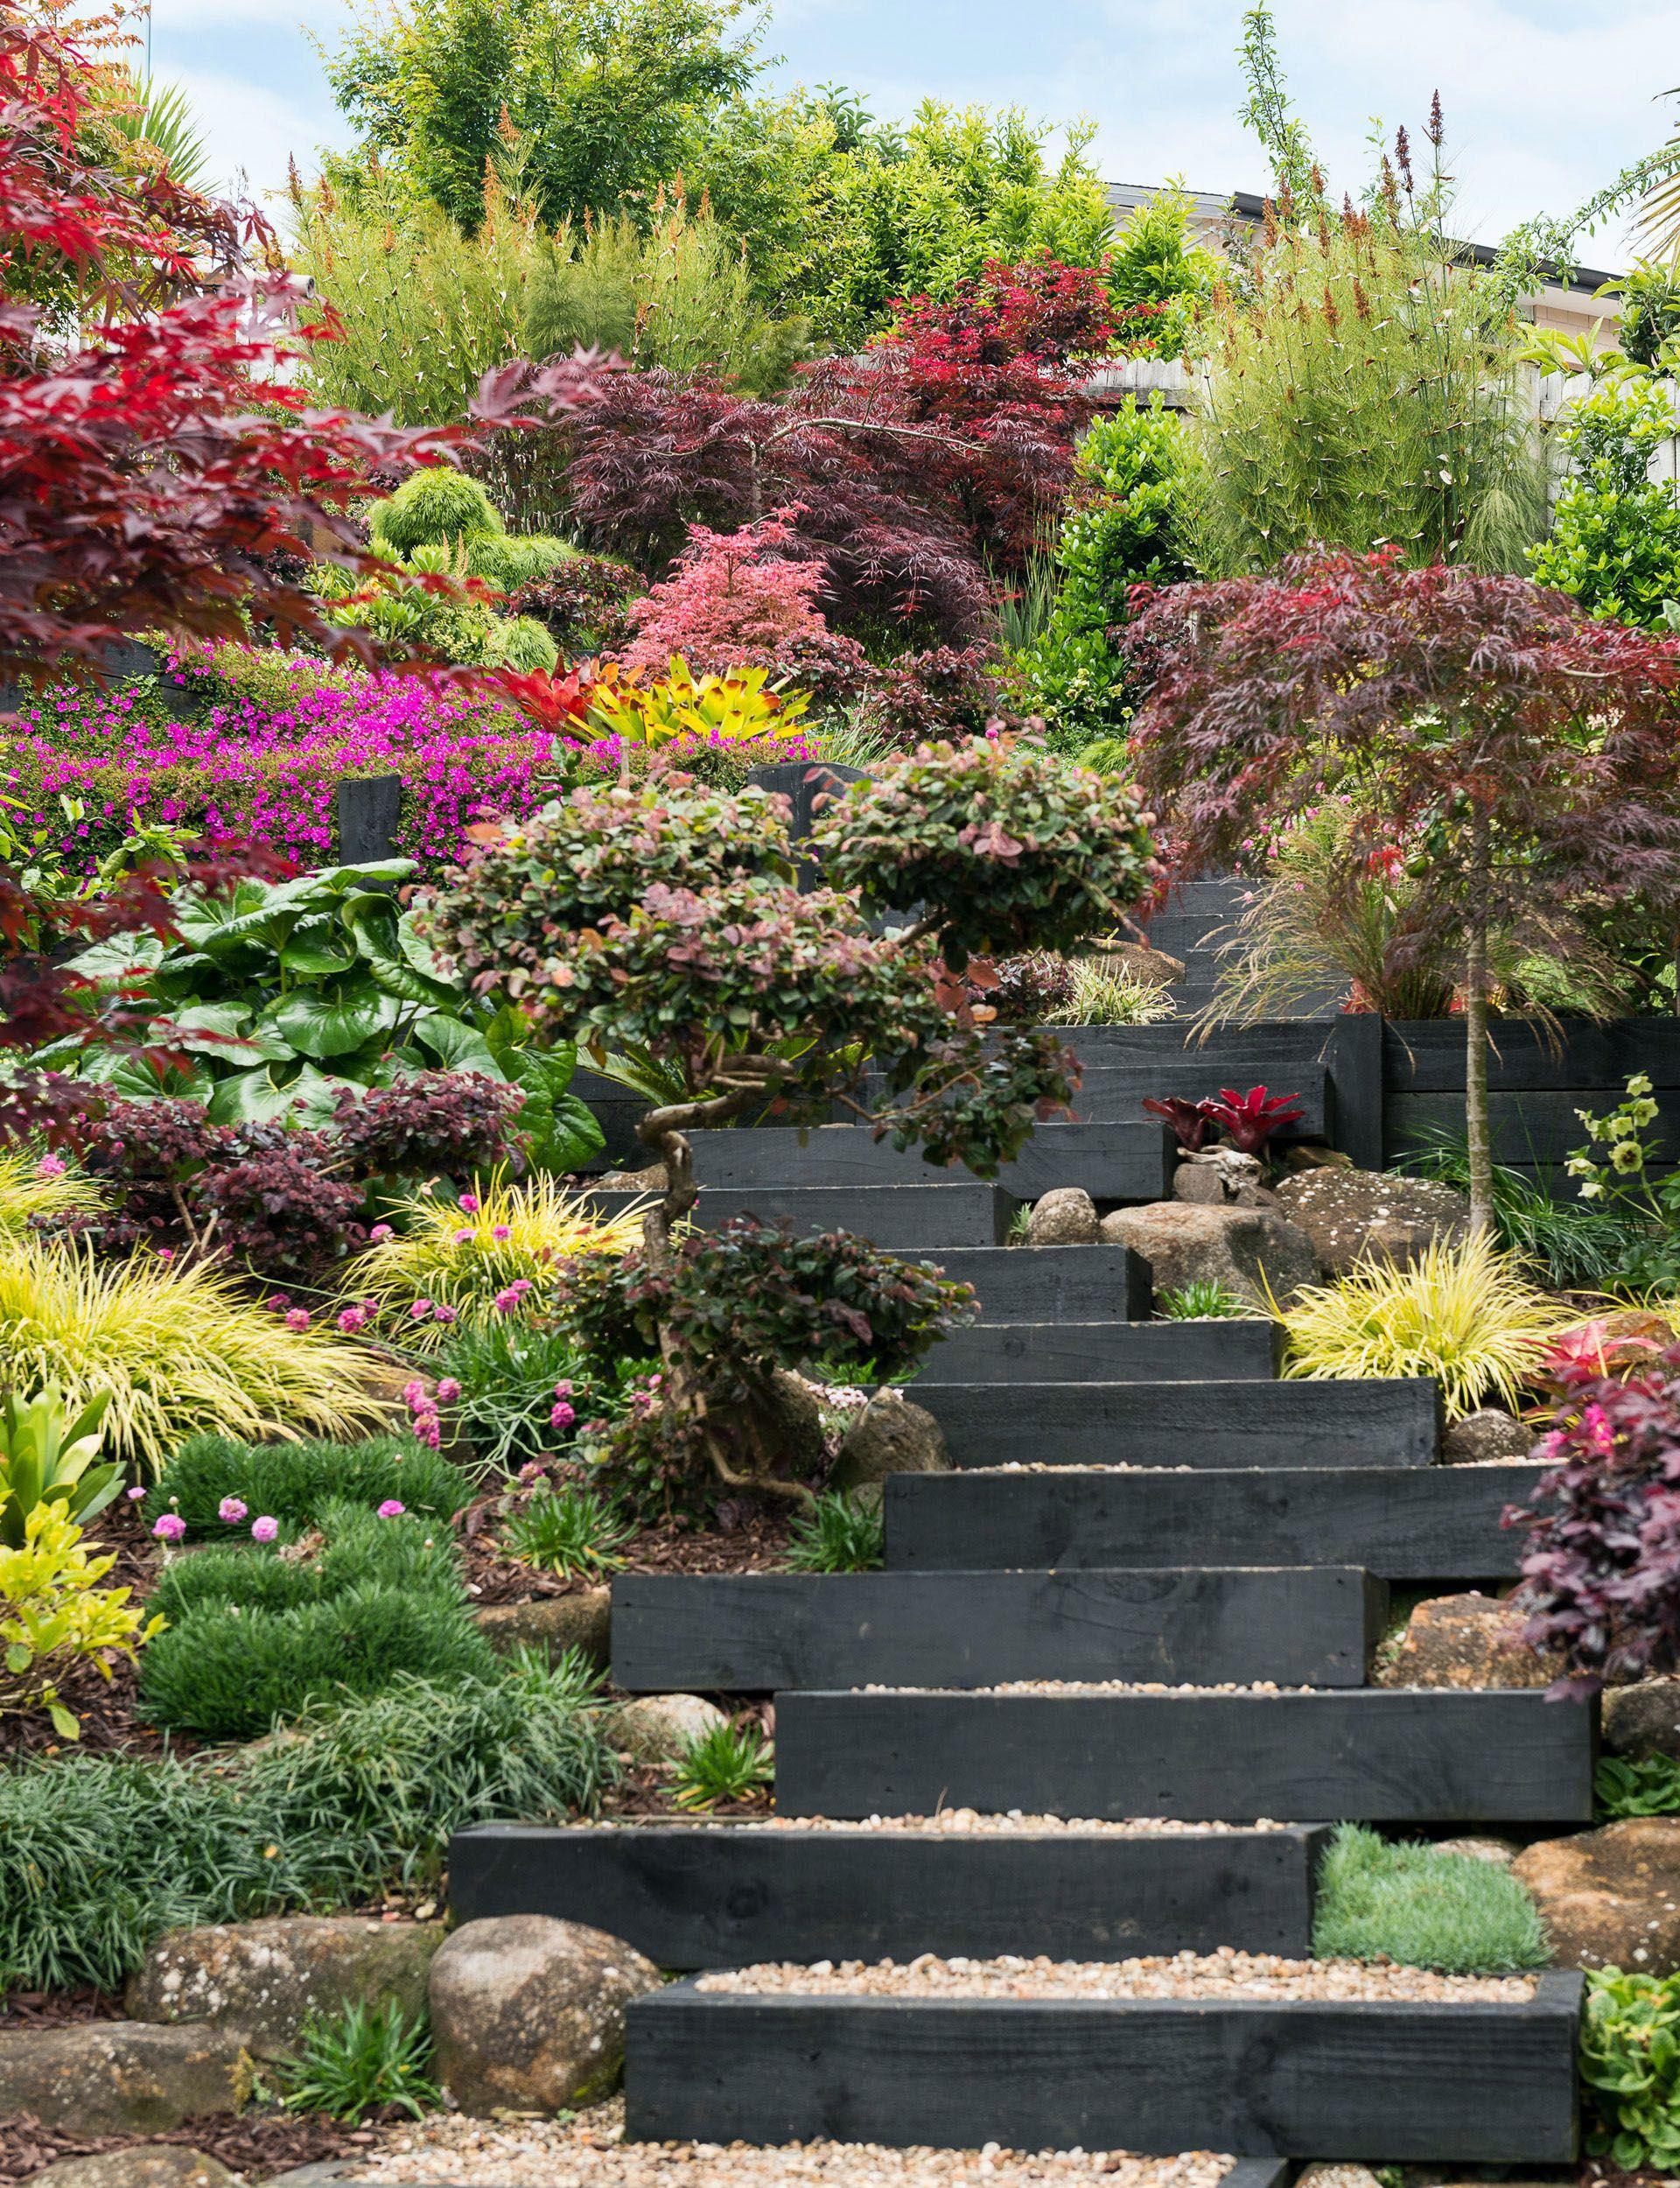 Incredible Zen Garden Wellness Stockton You Ll Love Sloped Backyard Landscaping Sloped Garden Garden Stairs